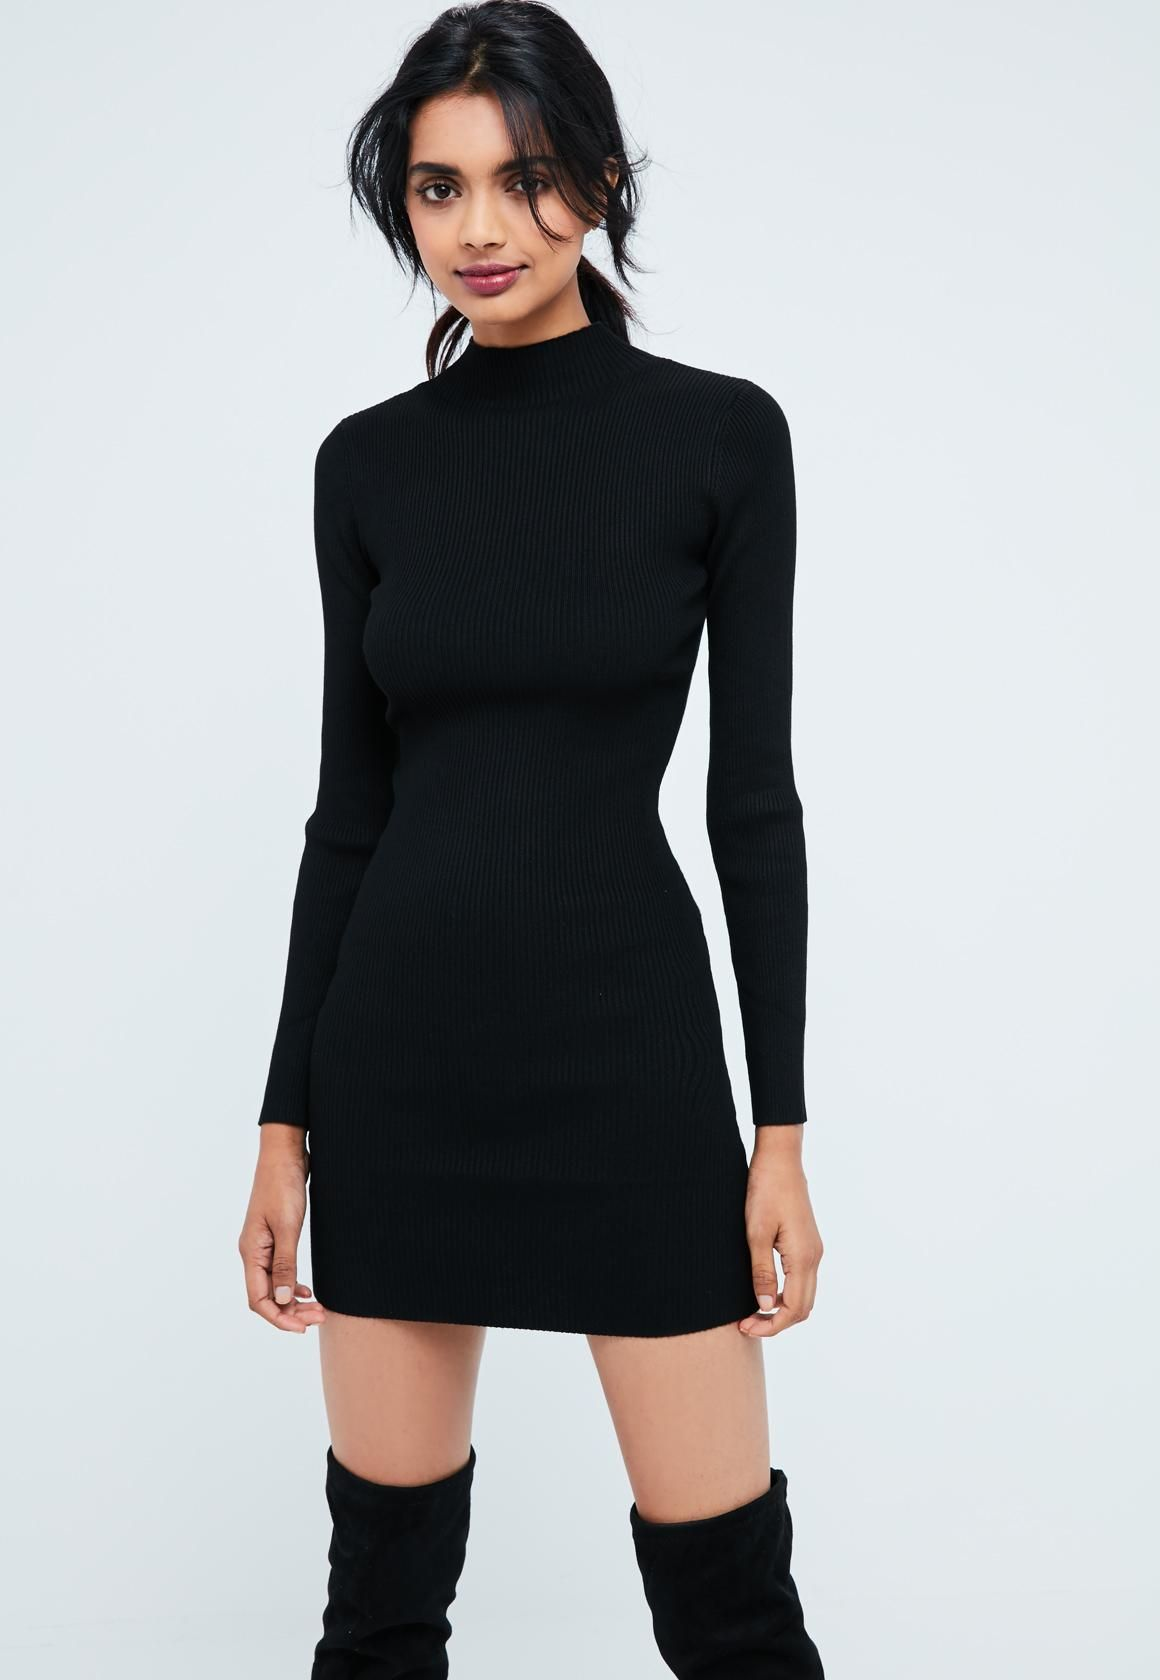 c2a5c2a11b Missguided Black Basic High Neck Long Sleeve Sweater Dress